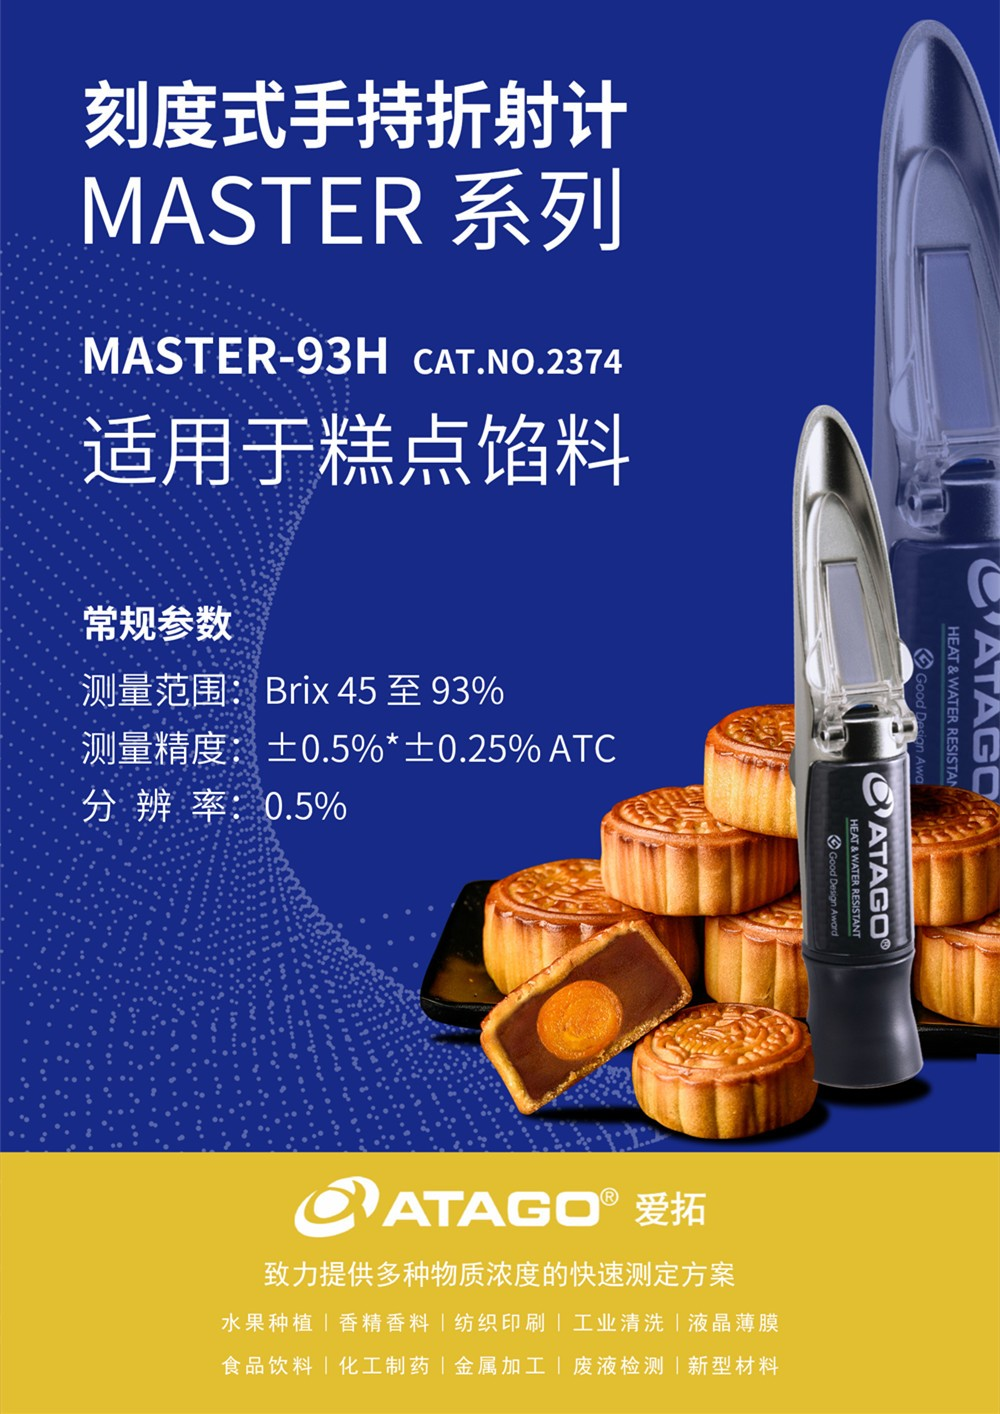 ATAGO(爱拓)刻度式手持折射计MASTER-93H.jpg